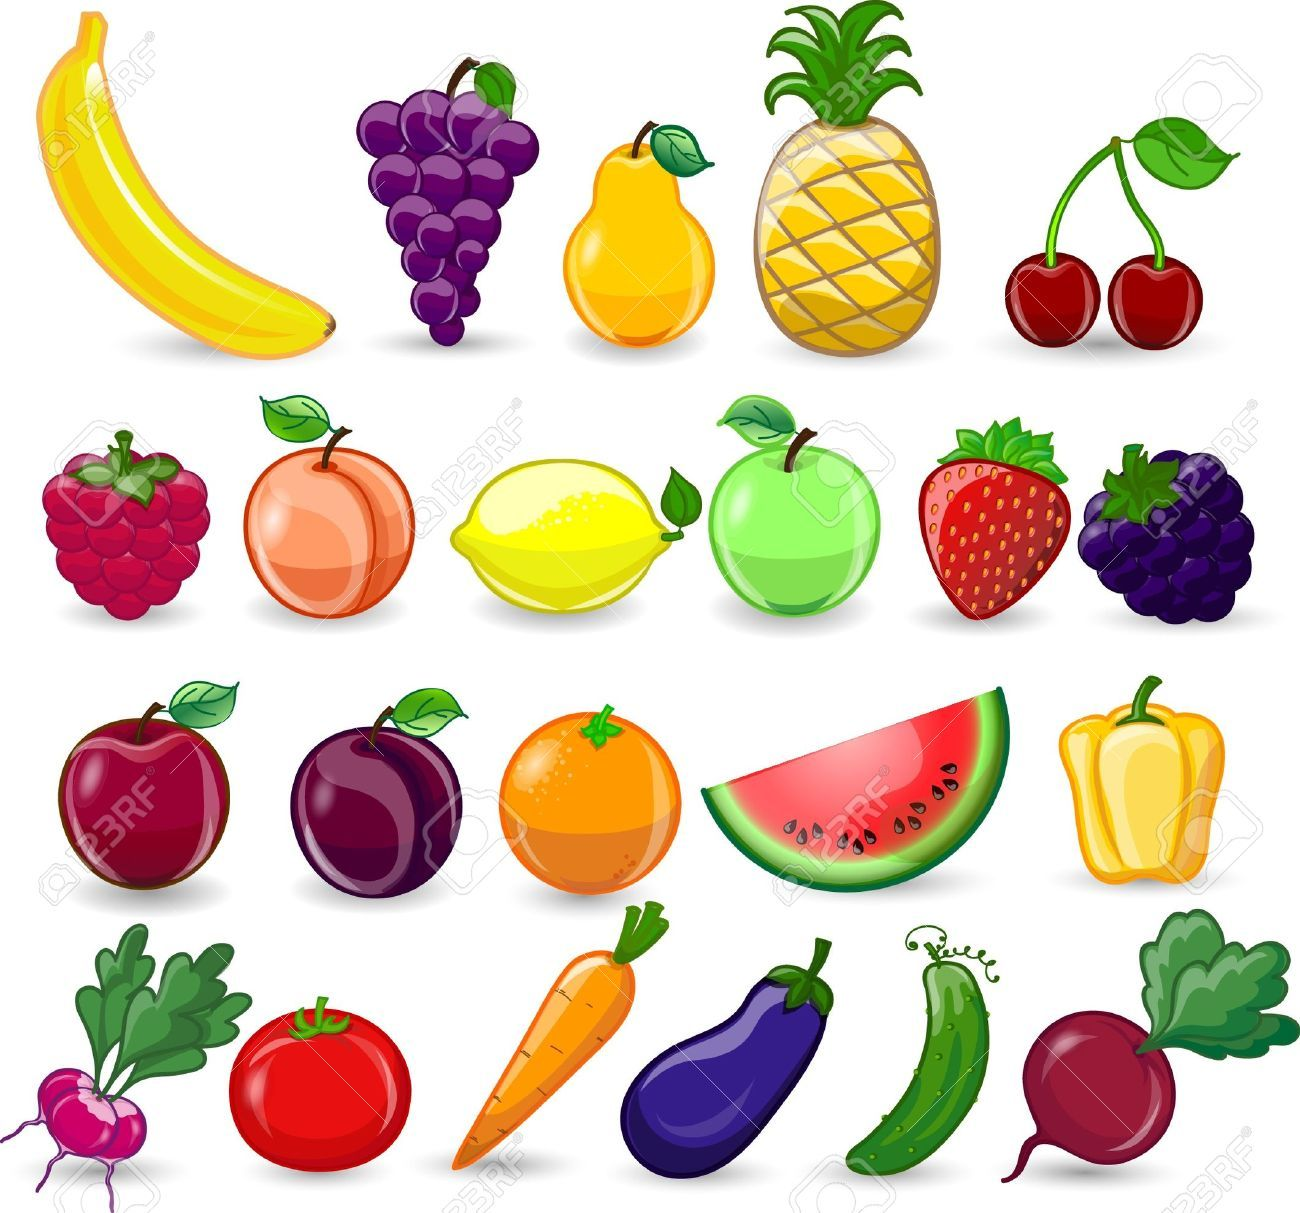 cute cartoon drawings of fruits - Google Search | Drawing ...